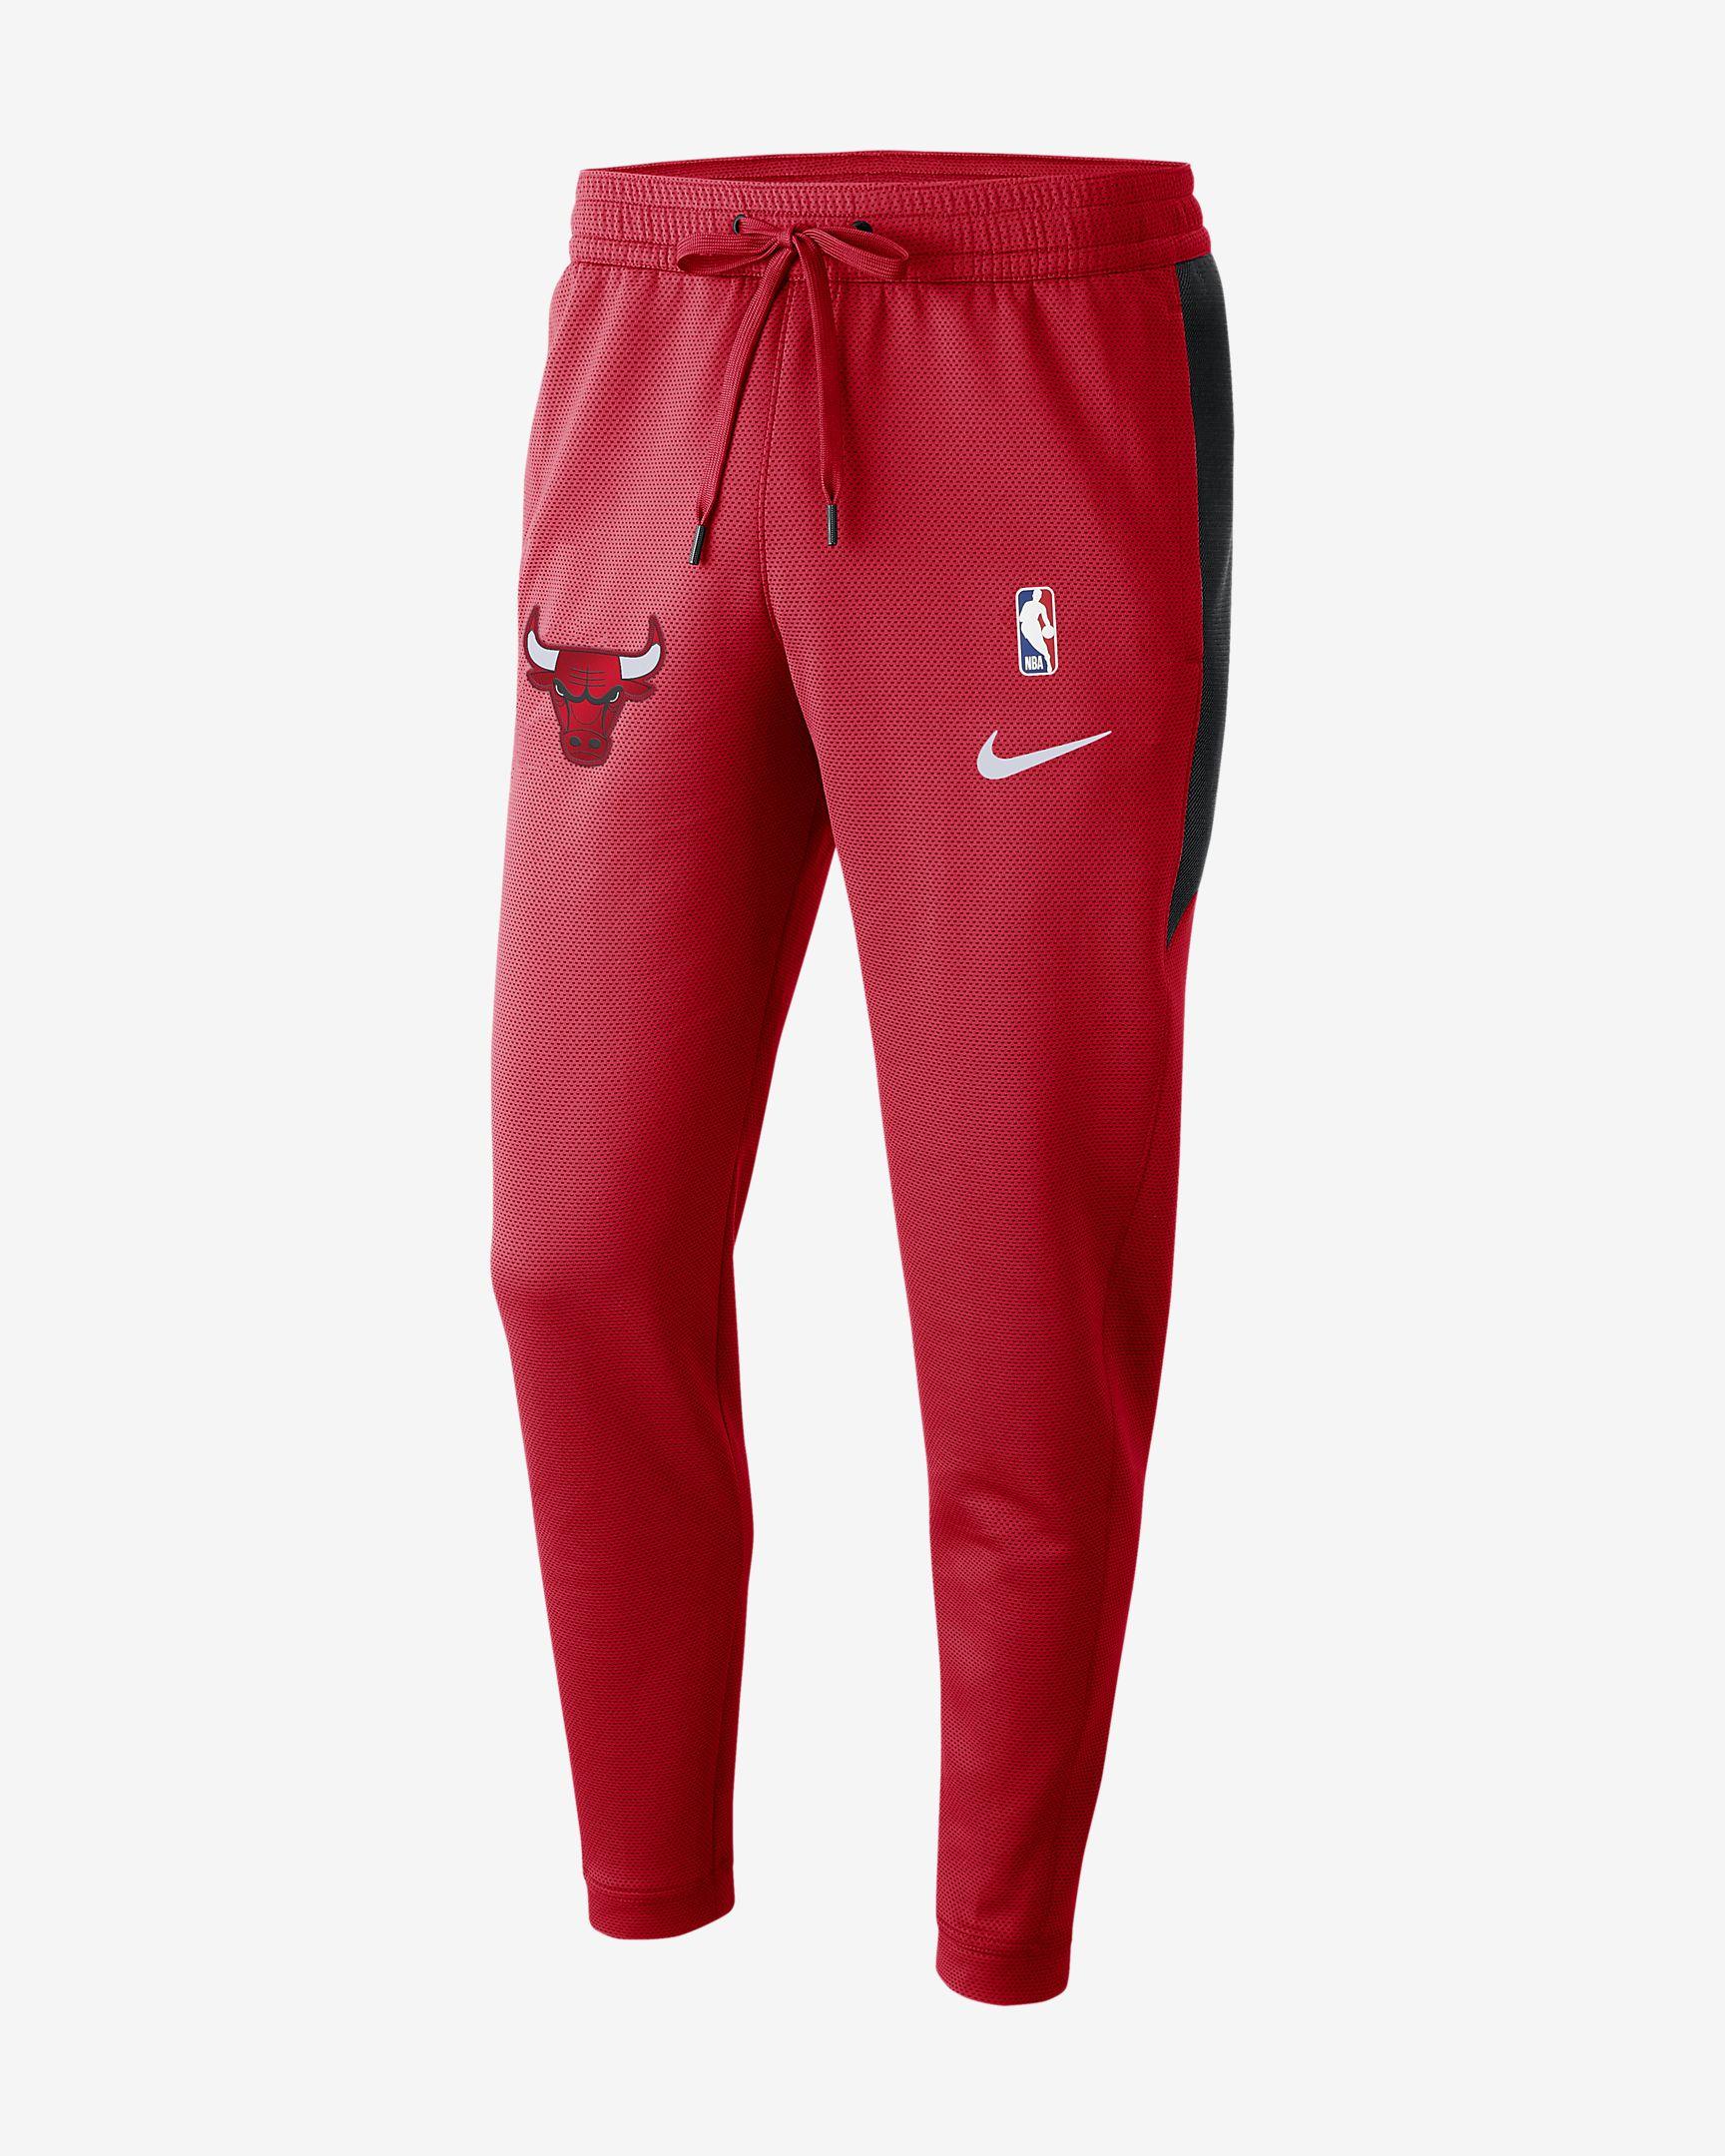 6fc043984 Nike NBA Chicago Bulls Therma Flex Showtime Pants - NBA Shop Chicago Bulls  Merchandise - Superfanas.lt